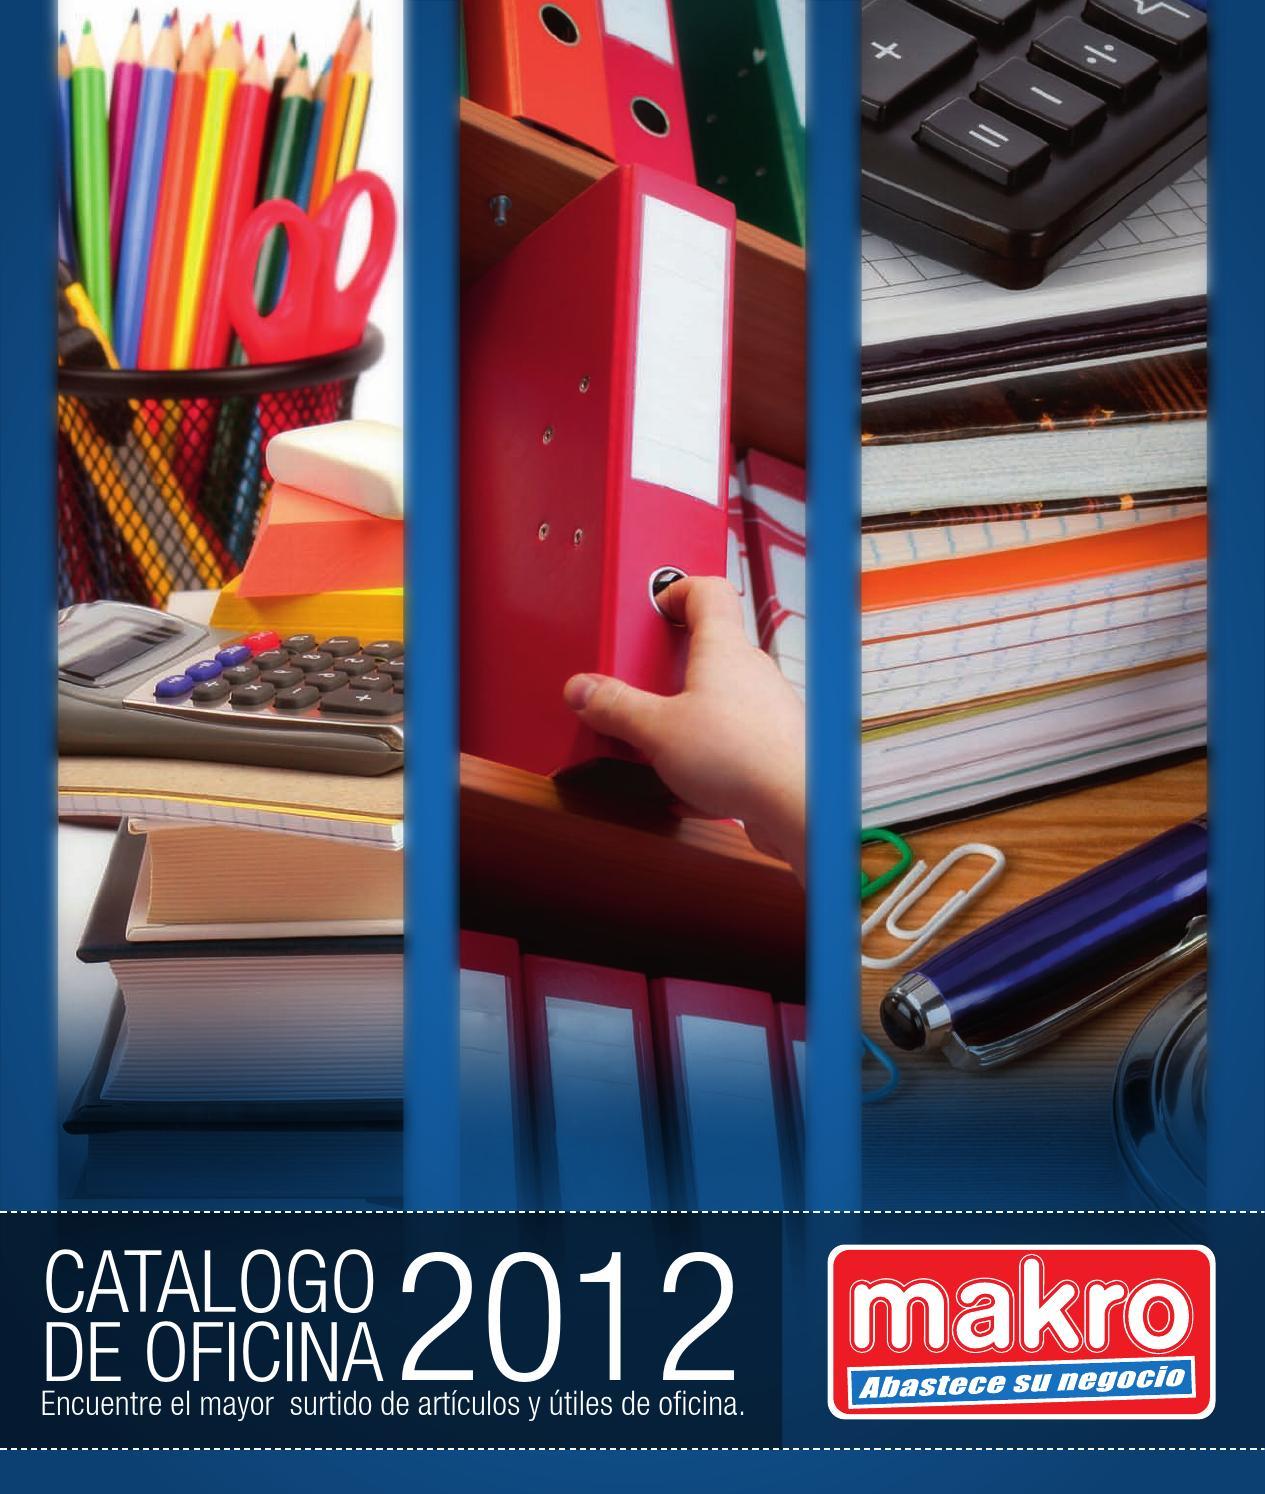 Makro Catálogo de Oficina 2012 by Makro-Peru Makro - issuu